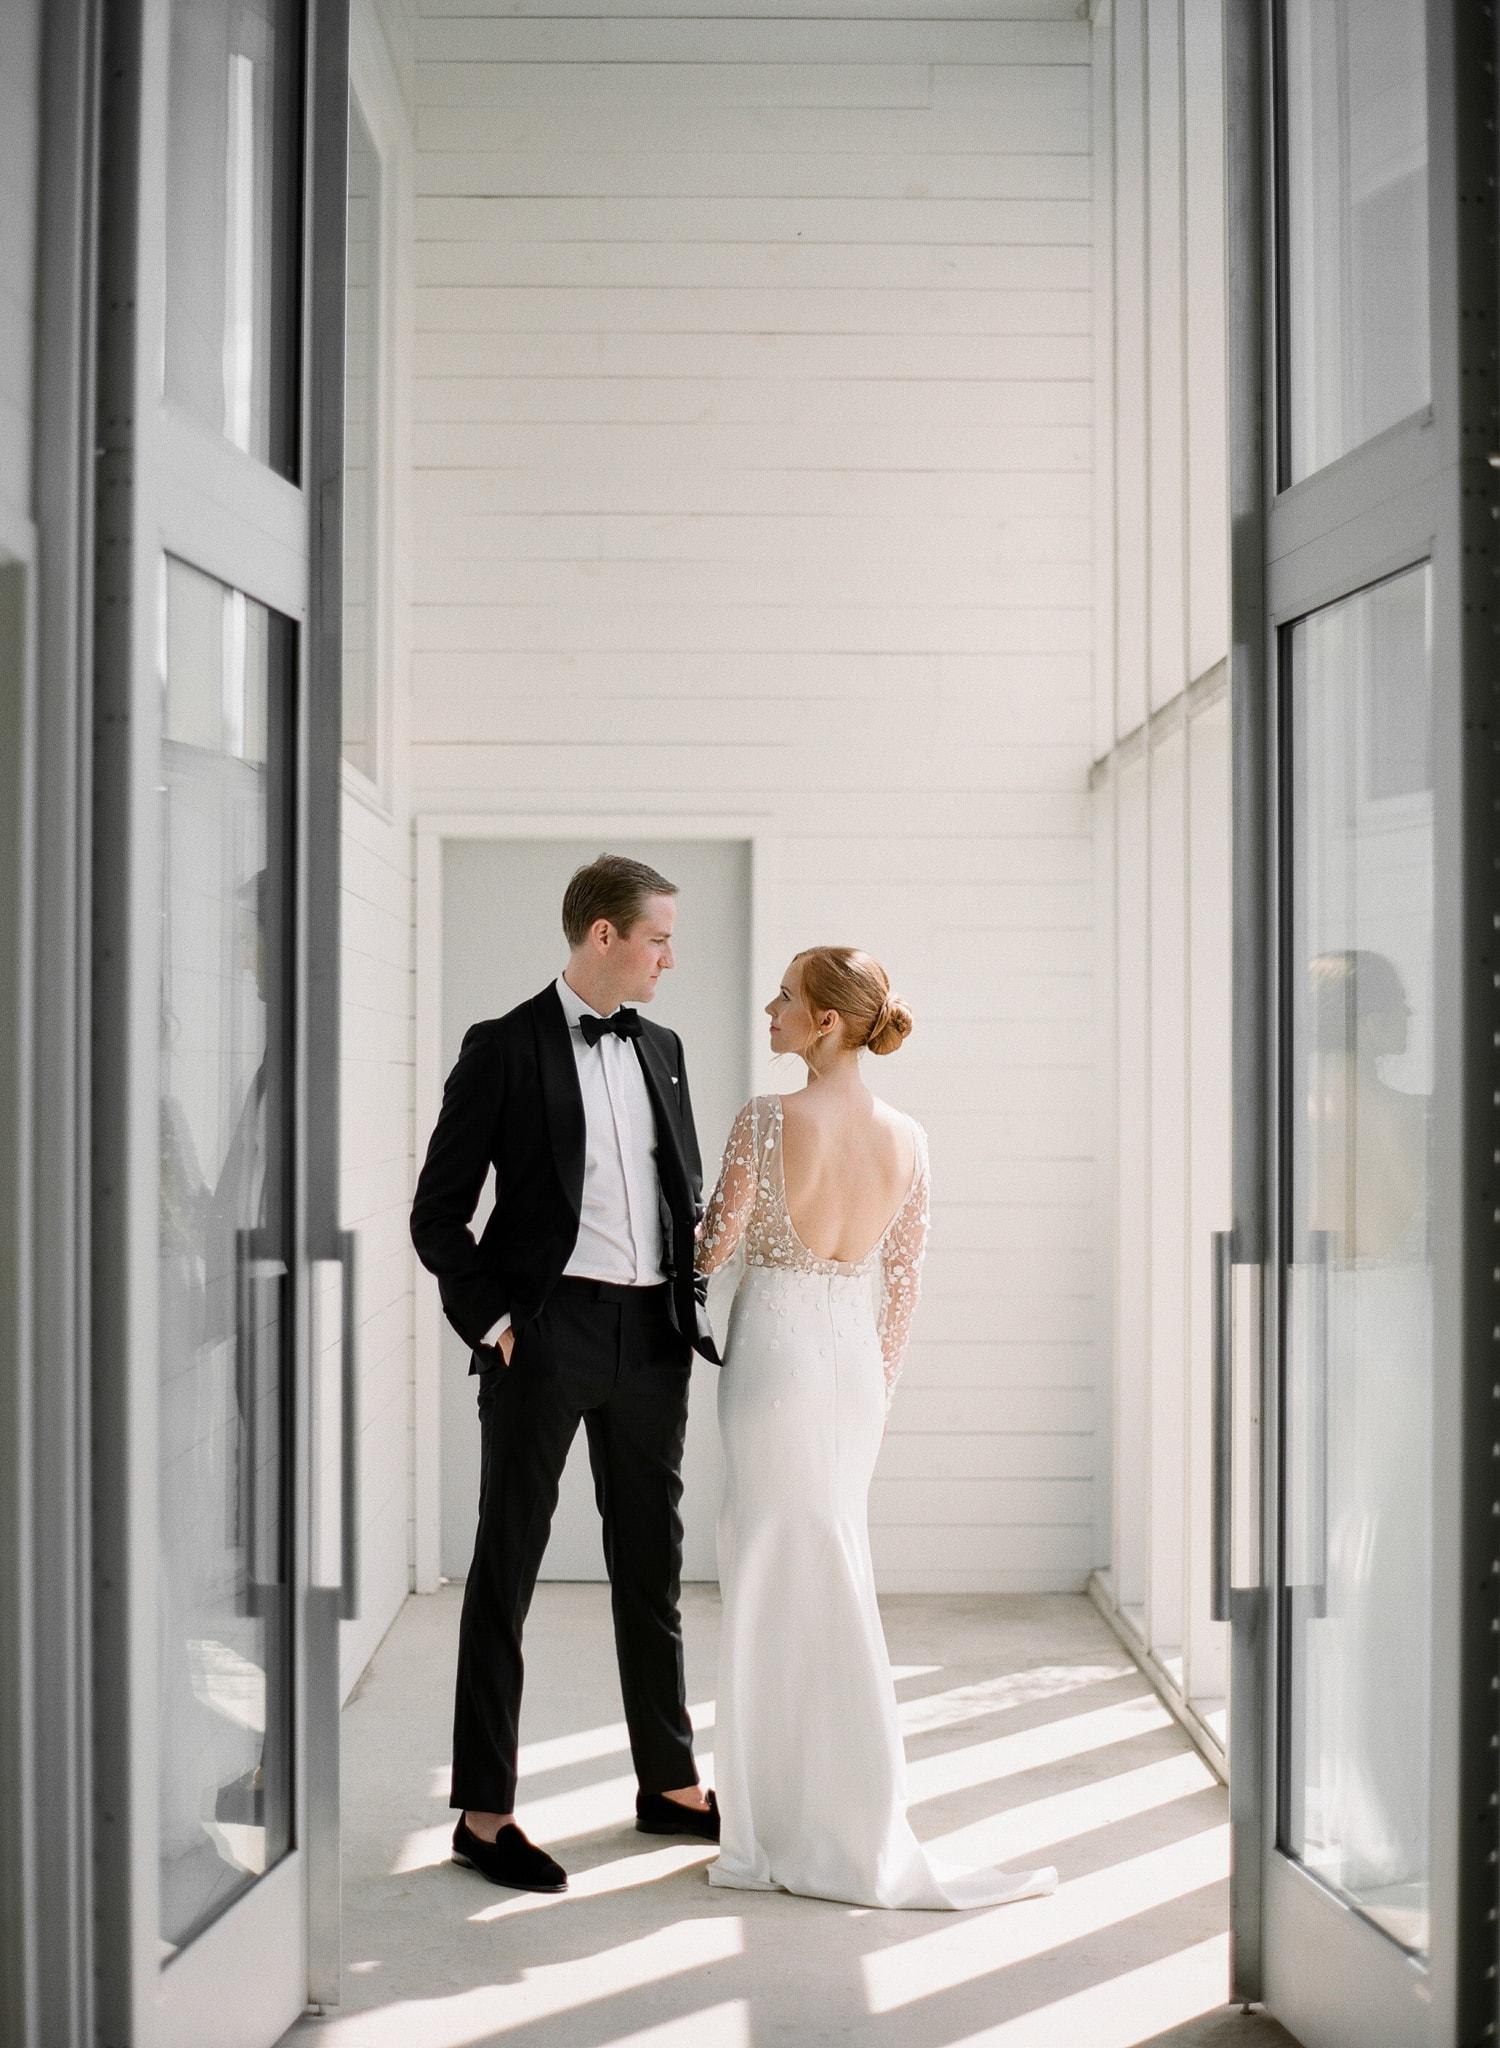 prospect-house-wedding-13.jpg